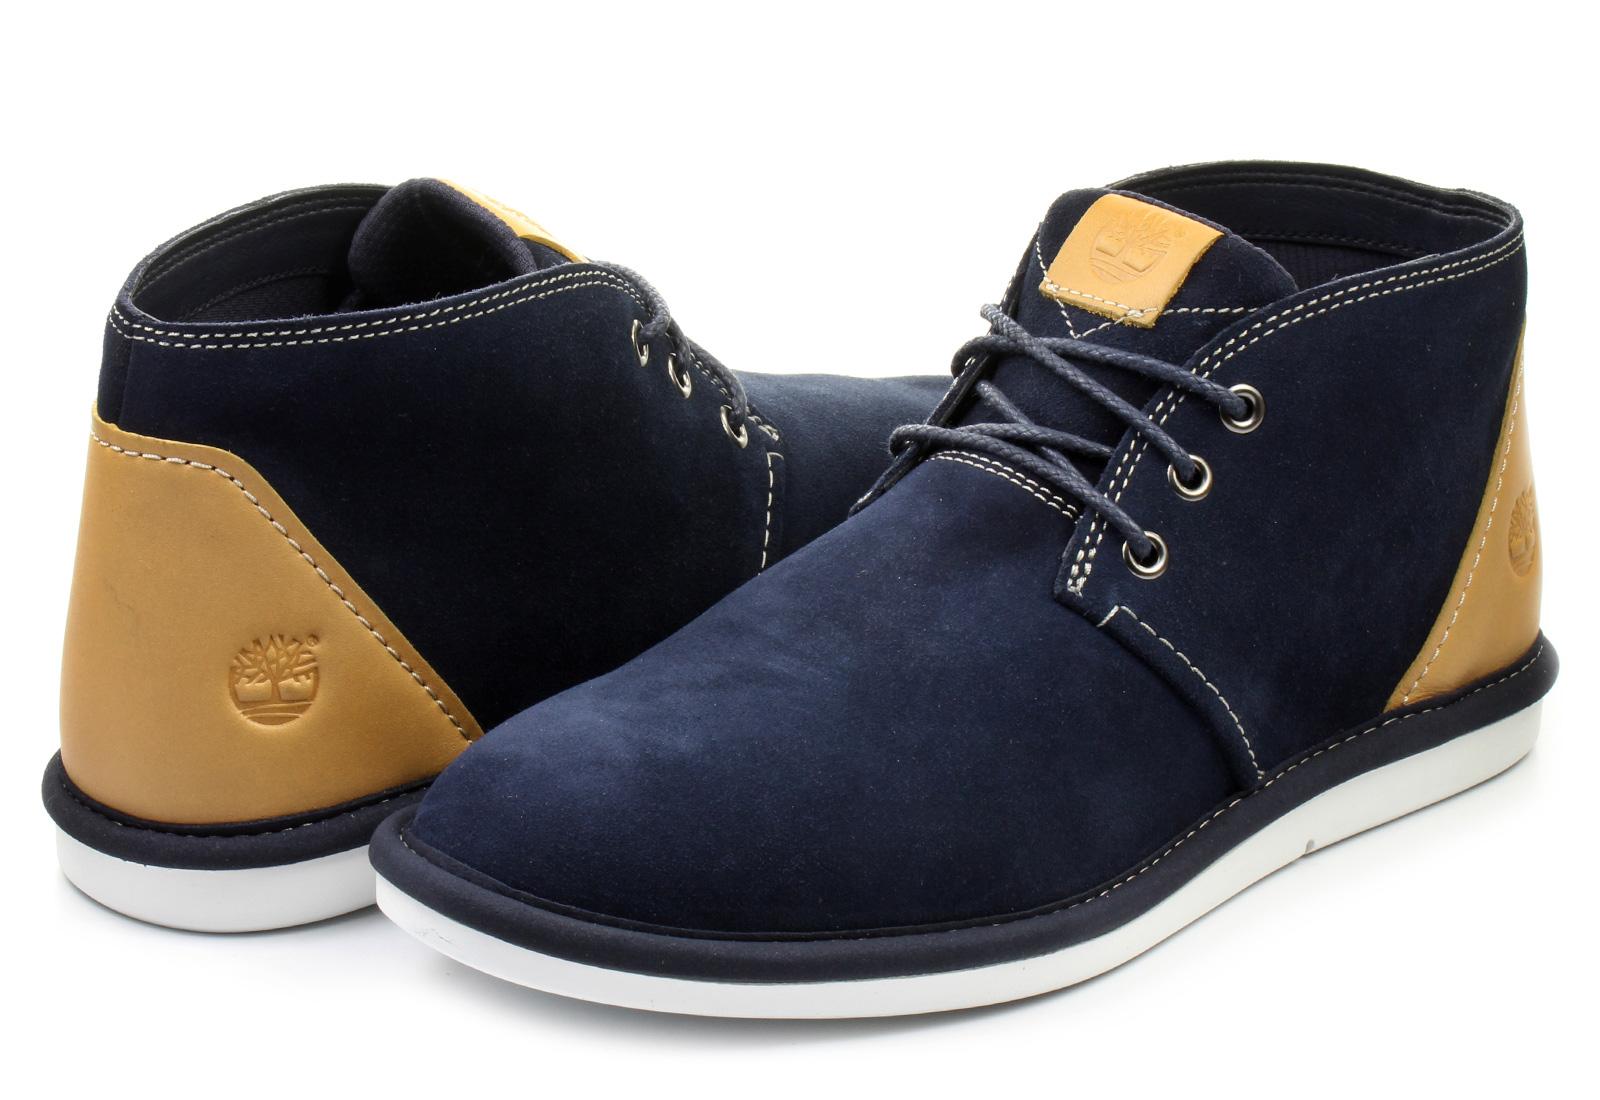 Shoe City Converse Price